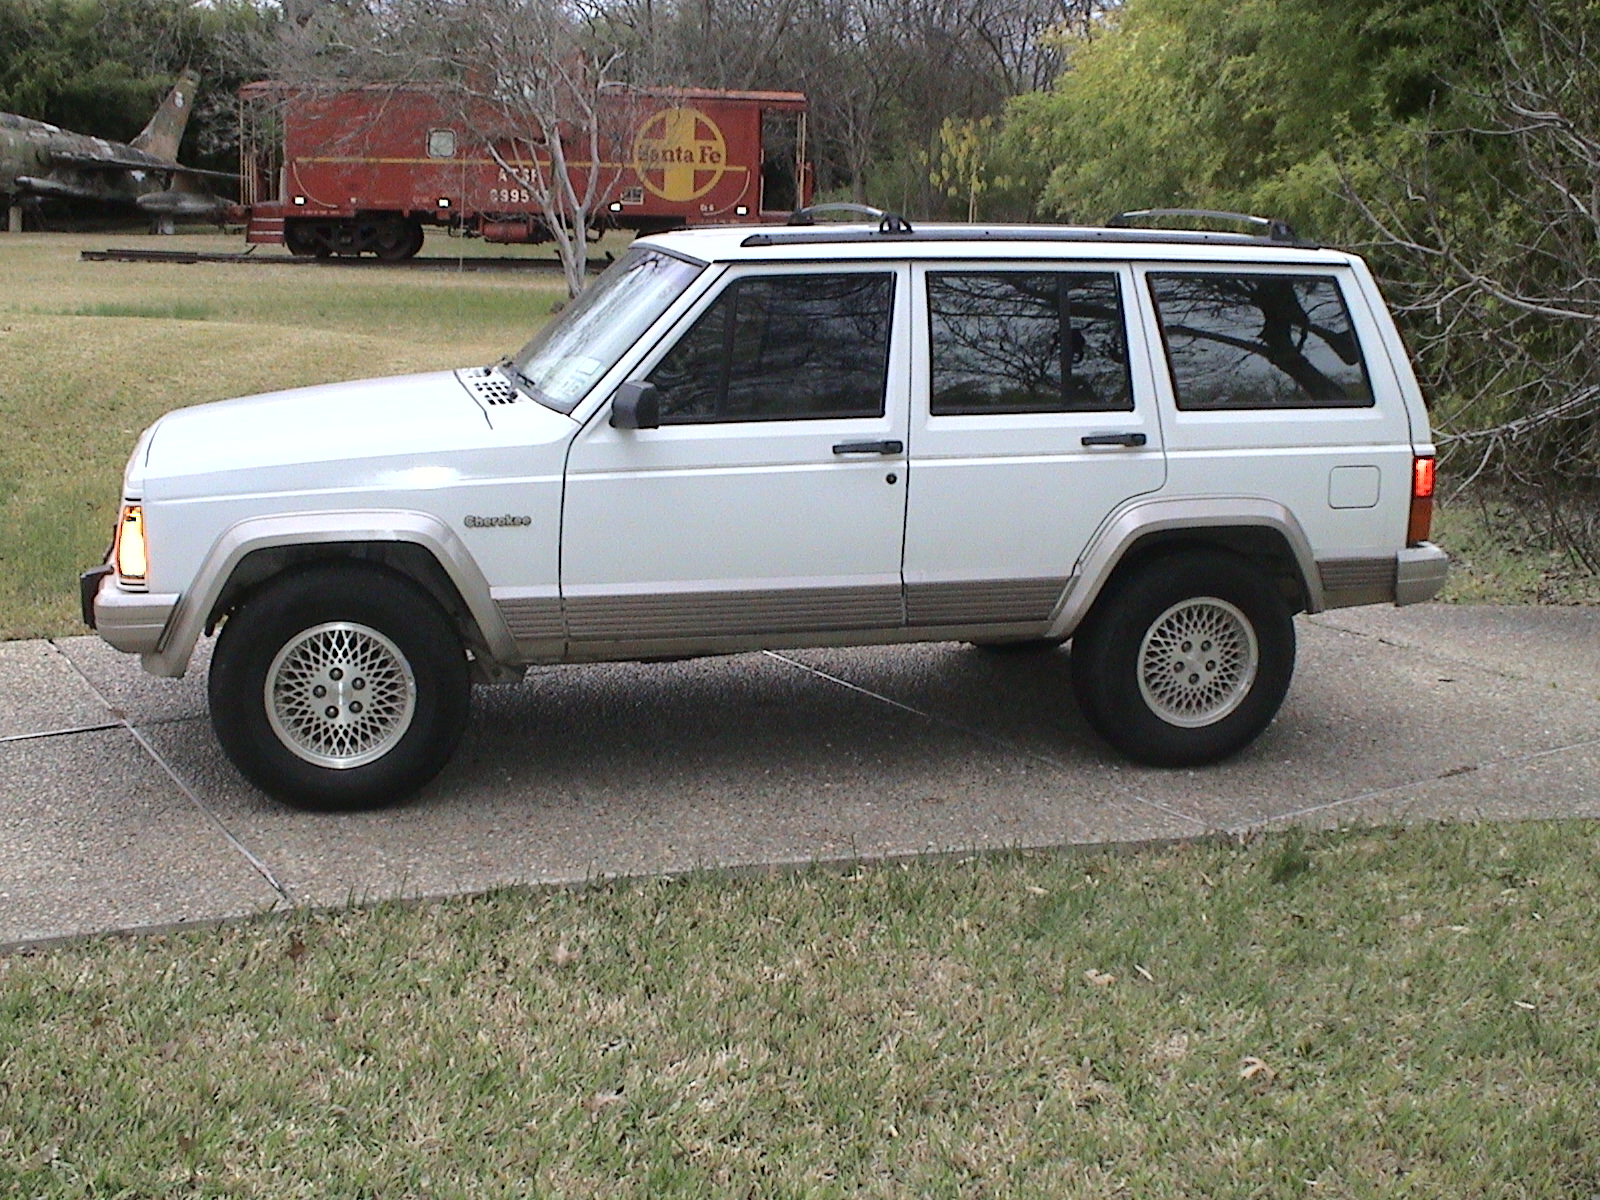 93 Jeep Cherokee - White